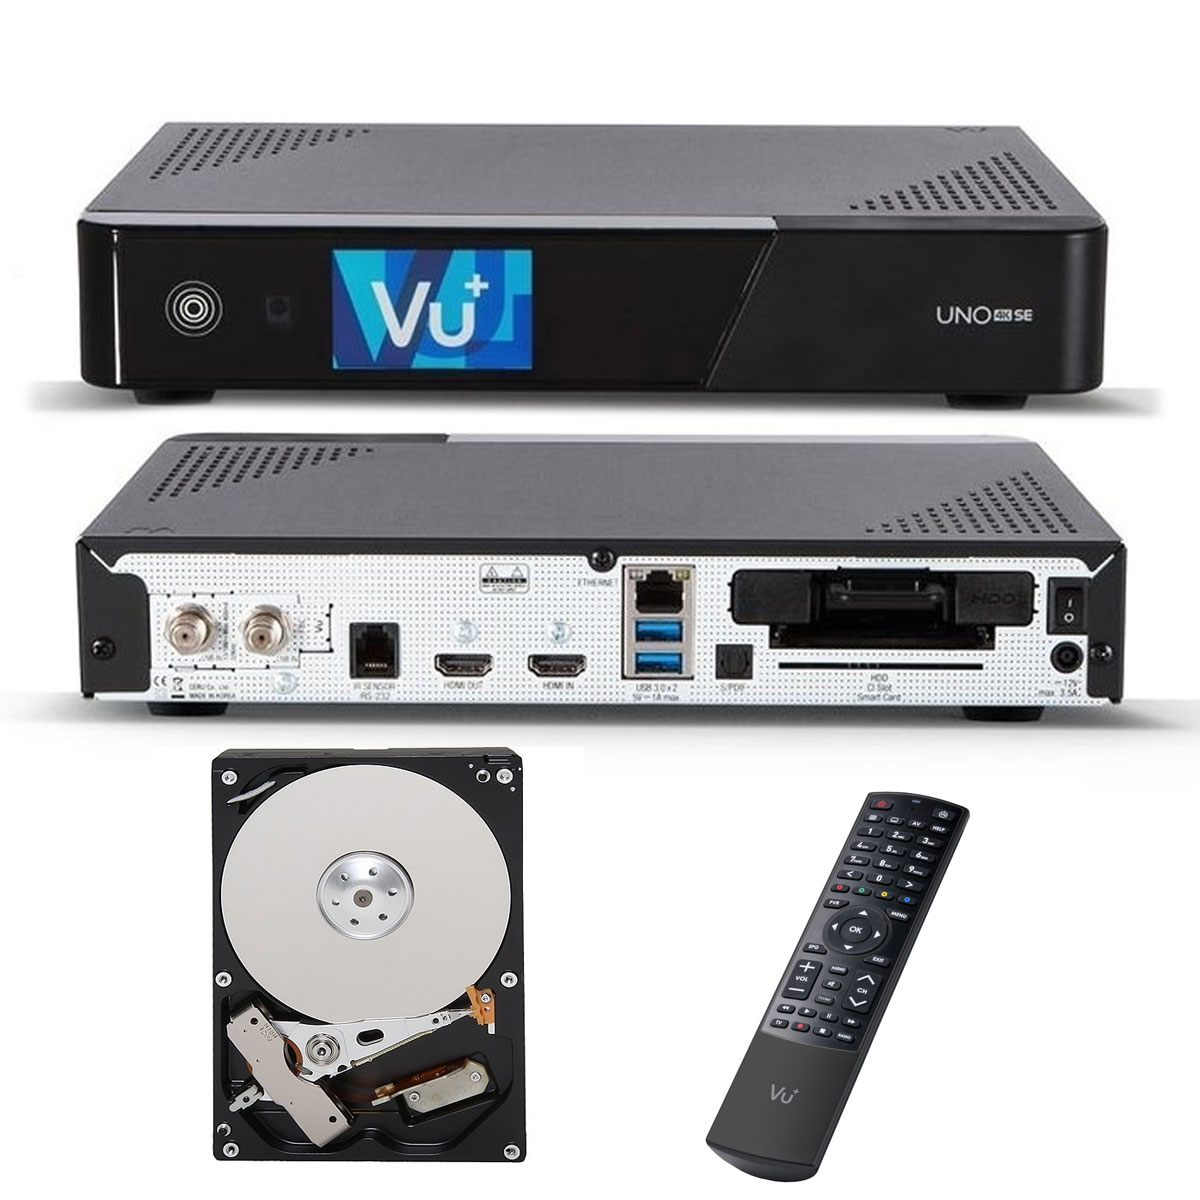 VU+ UNO 4K SE 1X DVB-S2 FBC TWIN TUNER PVR READY SAT LINUX RECEIVER UHD 2160P + 500GB HDD